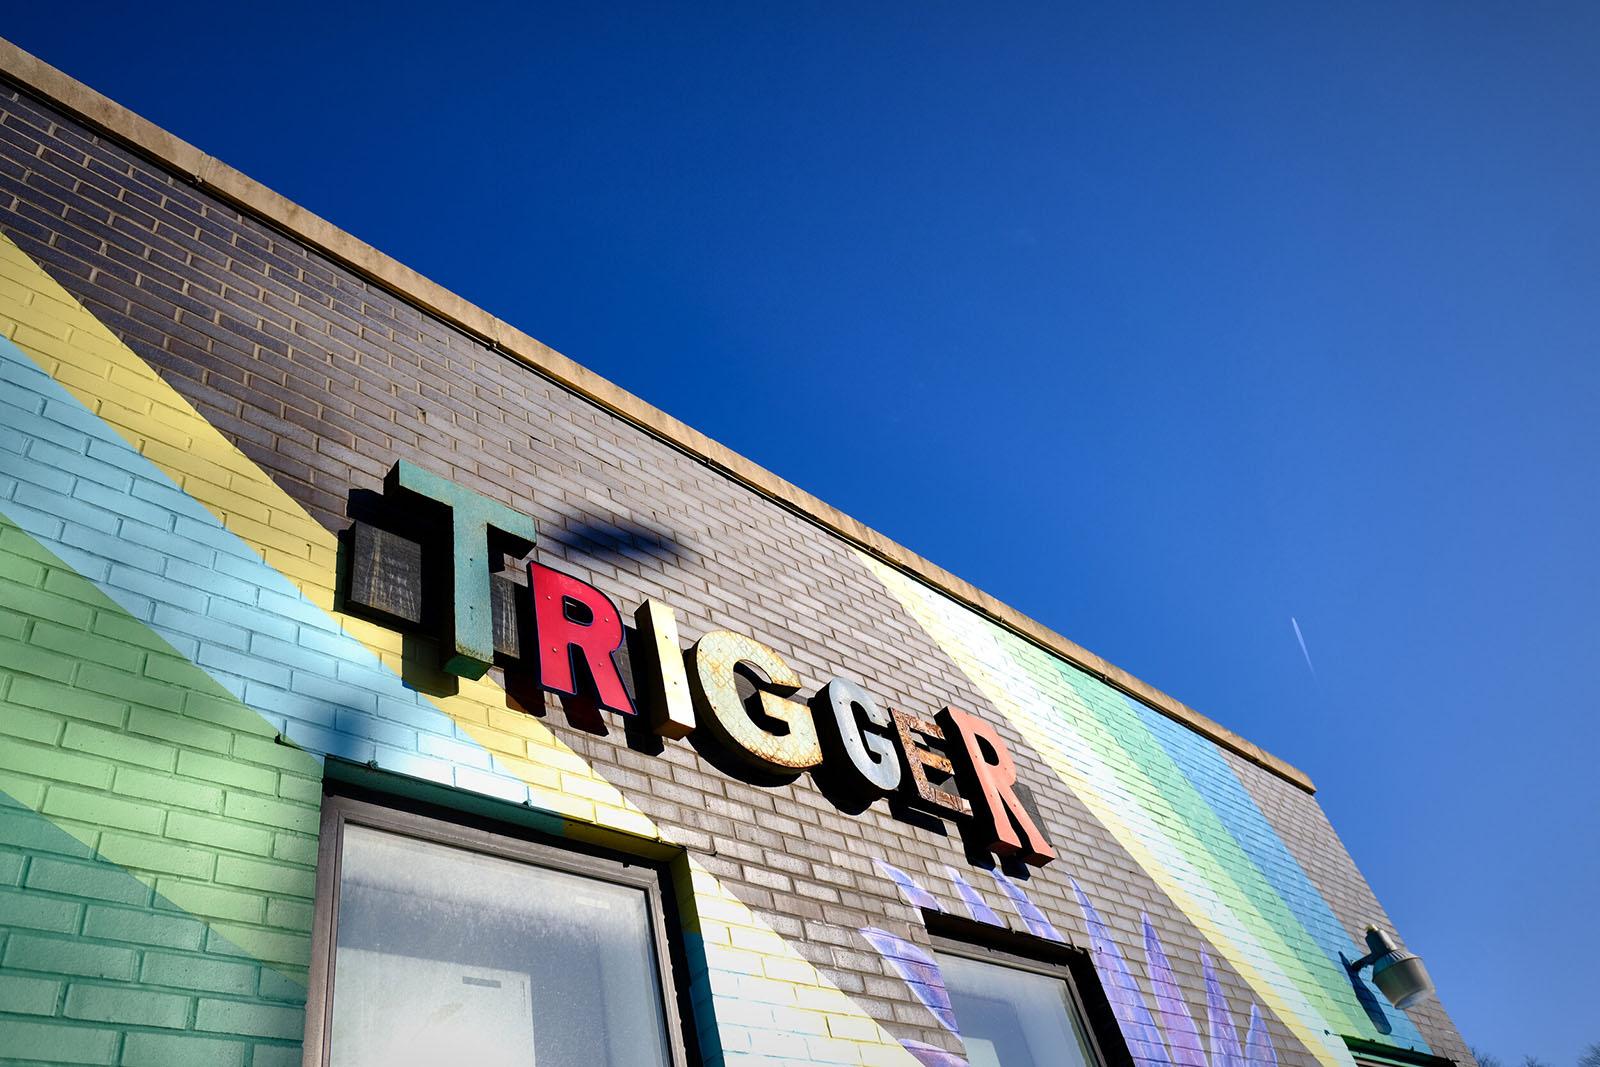 Trigger Chicago